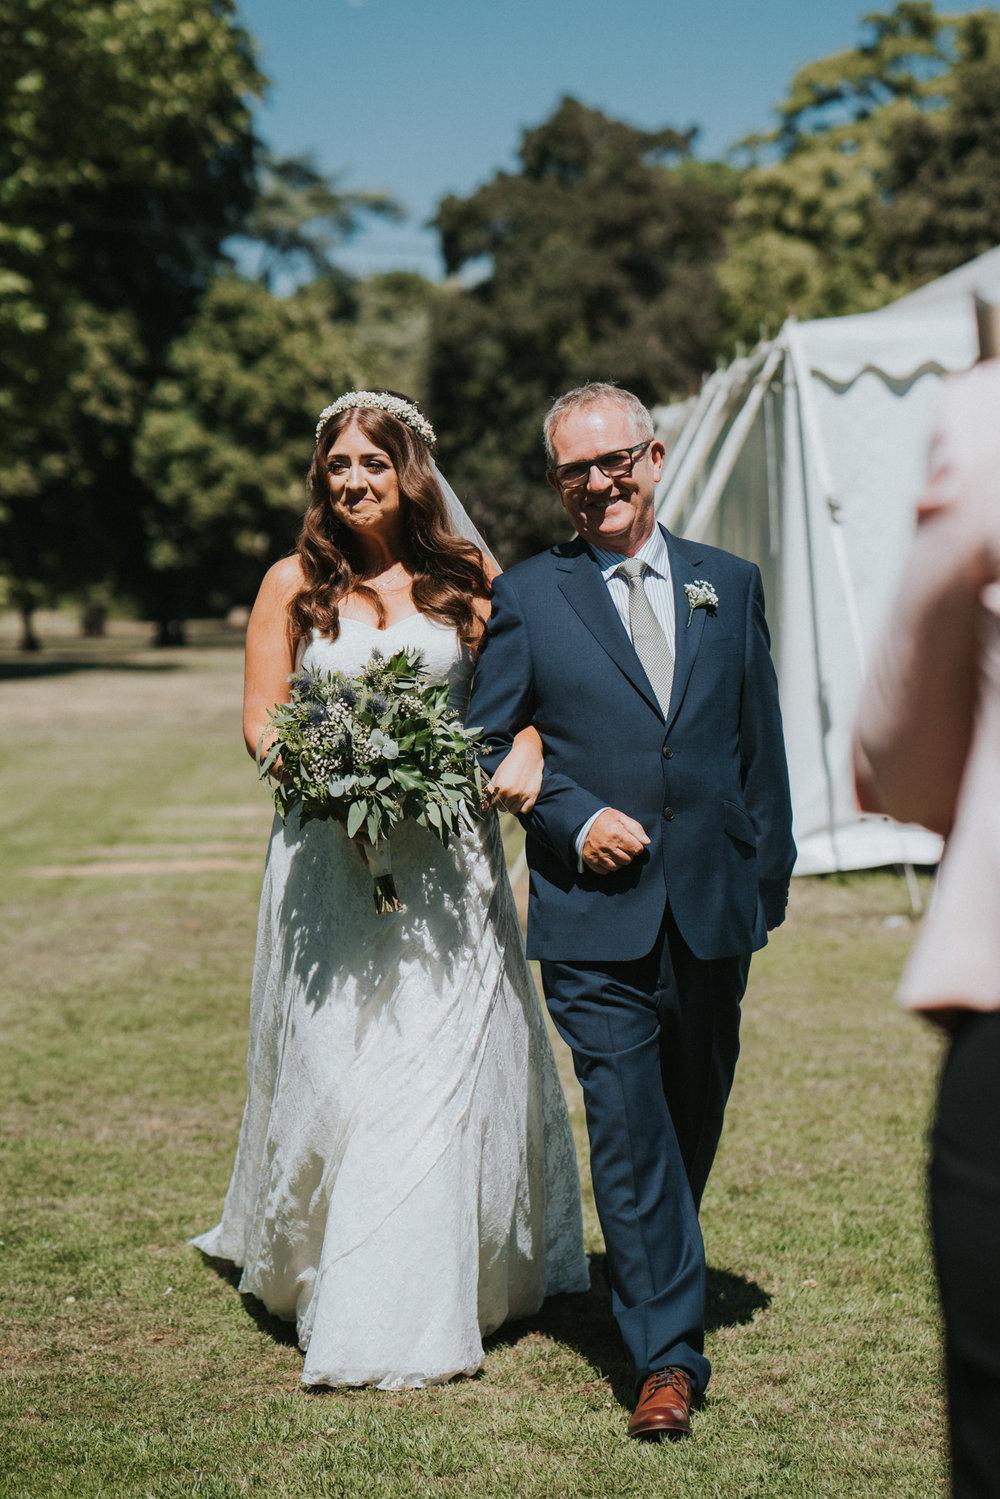 Sophie-Christian-Prested-Hall-Grace-Elizabeth-Previews-Essex-Norfolk-Suffolk-Devon-Alternative-Wedding-Photographer (6 of 20).jpg